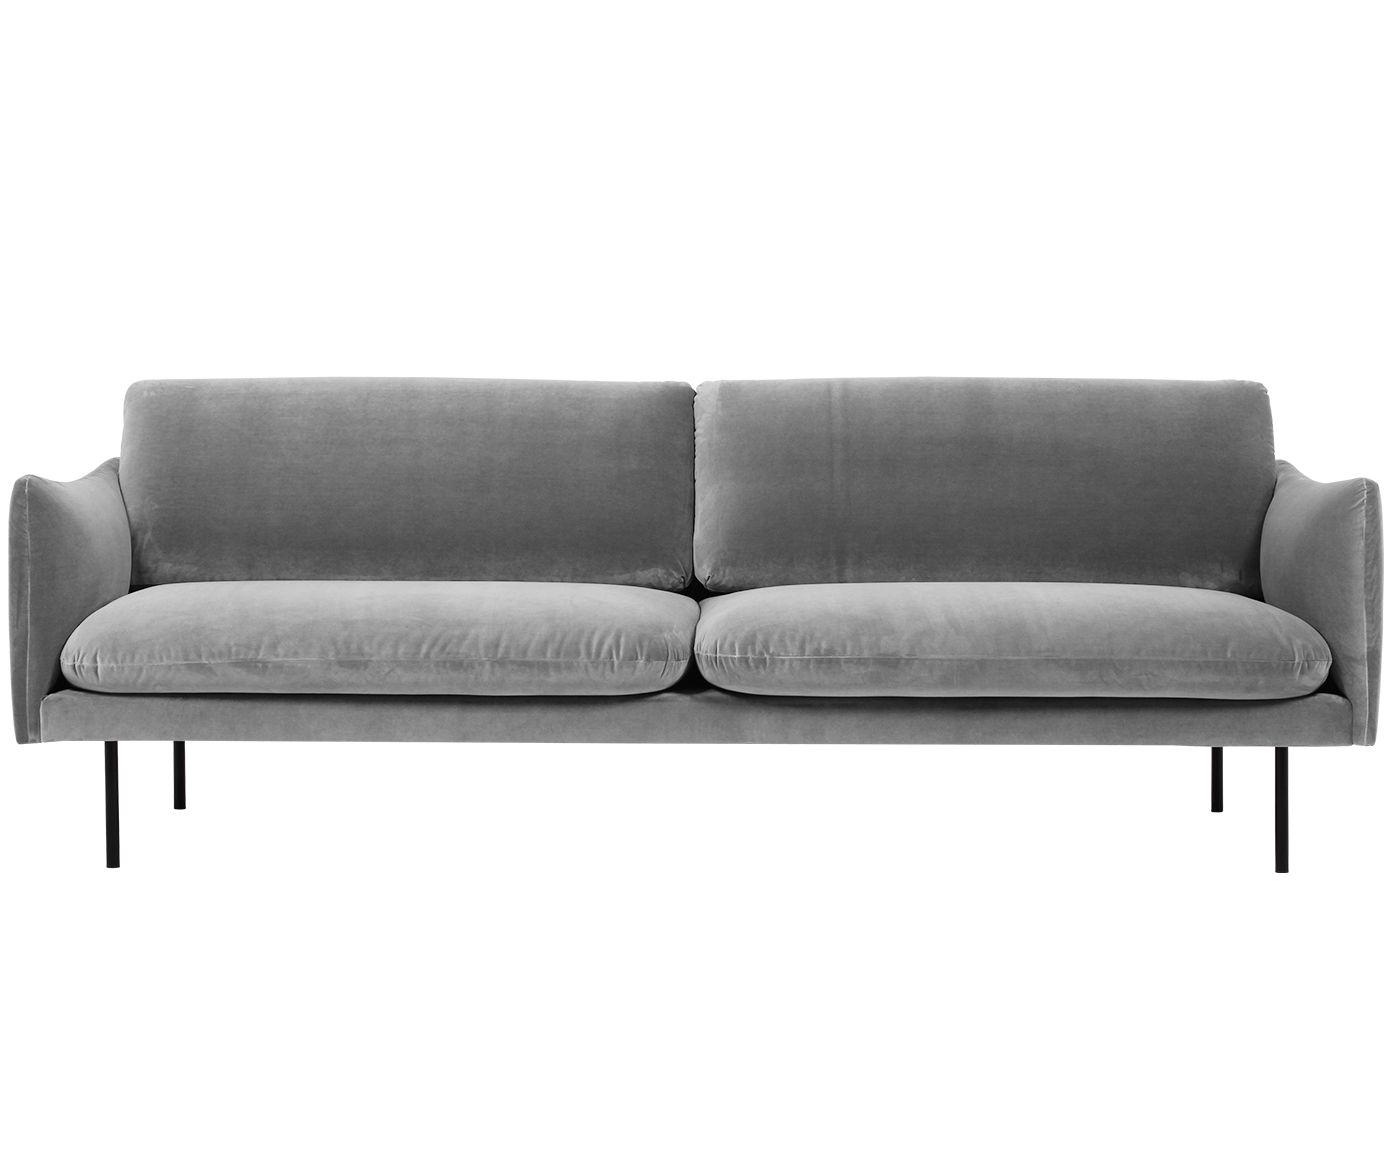 Full Size of Sofa 3 Sitzer Grau Samt Retro Kingsley 3 Sitzer Ikea Couch Rattan Nino Schwarz/grau Mit Schlaffunktion 2 Und Louisiana (3 Sitzer Polster Grau) Leder Moby 2er Sofa Sofa 3 Sitzer Grau